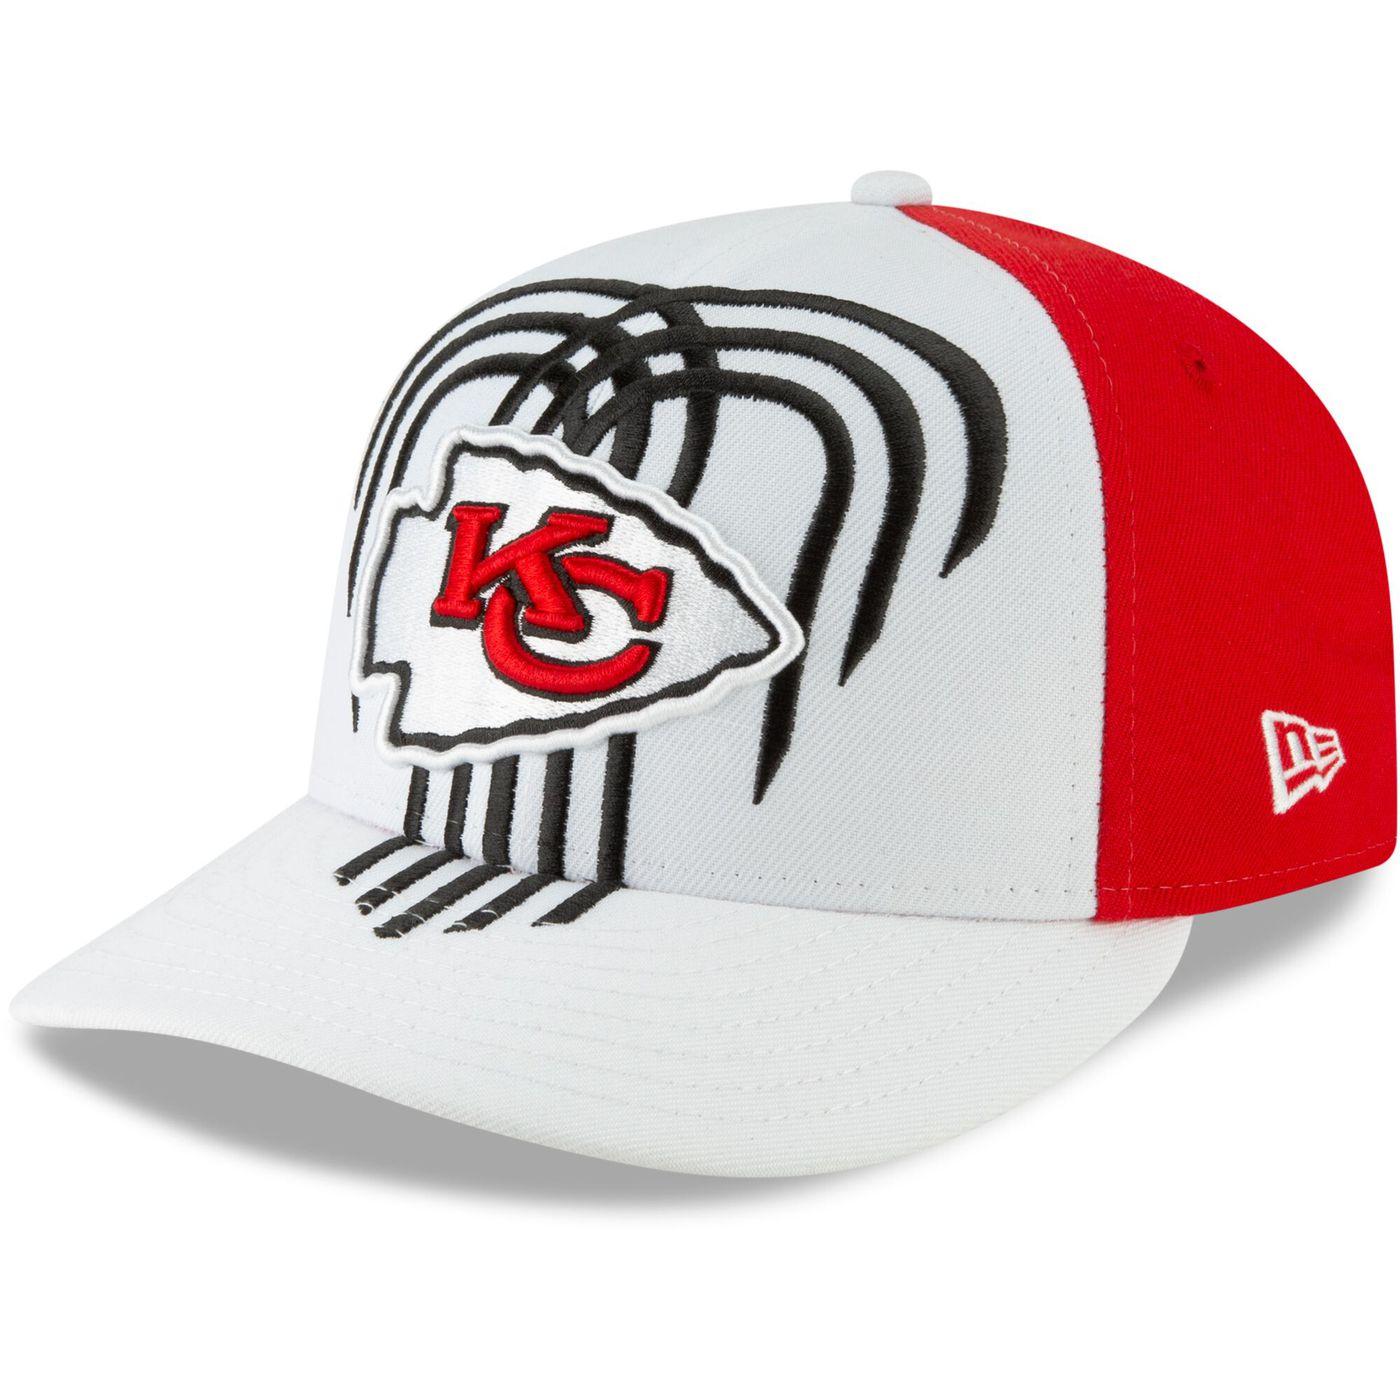 cde2db8aad10b2 Kansas City Chiefs 2019 draft hats are here - Arrowhead Pride